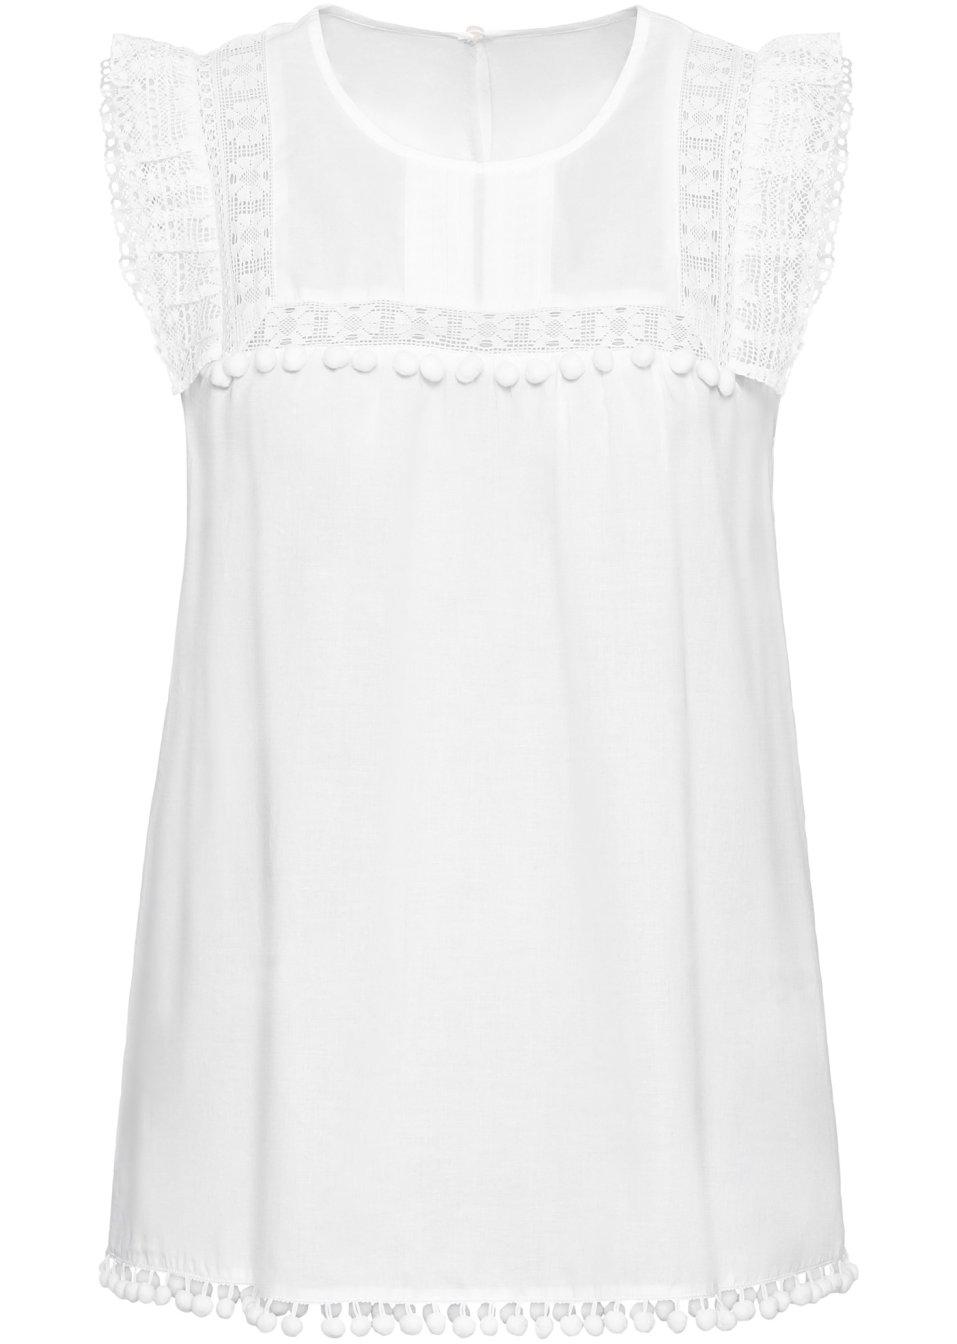 Bluse mit Spitze weiß - Damen - bonprix.de qSCNw fmajC